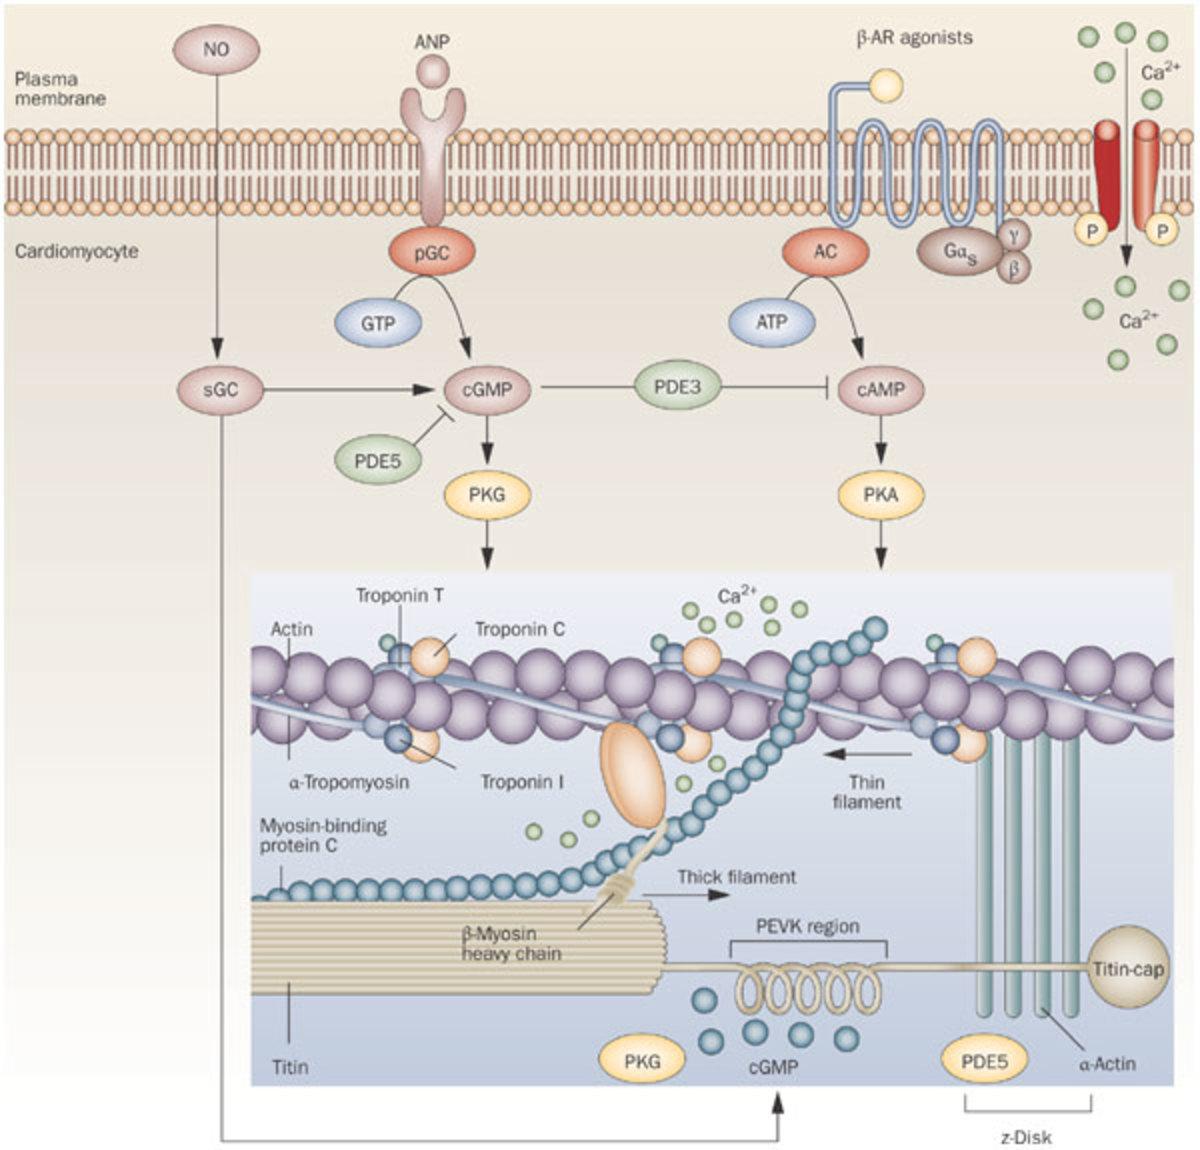 cGMP 2nd messenger pathway